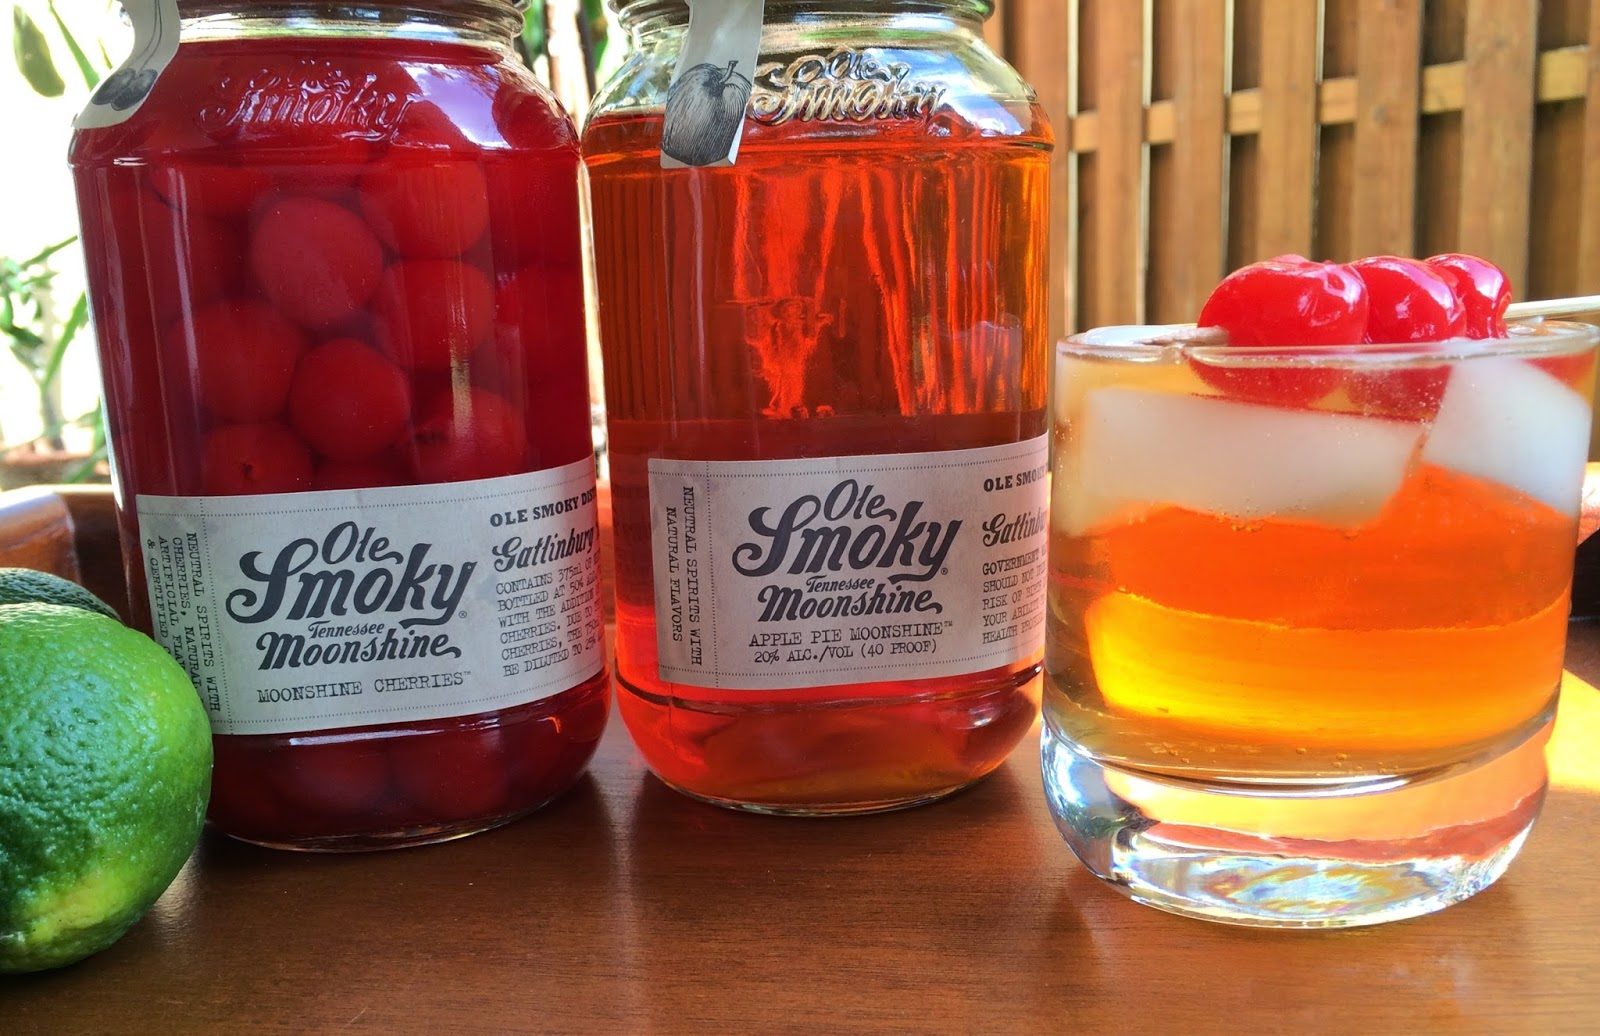 ole smoky apple pie moonshine - photo #22